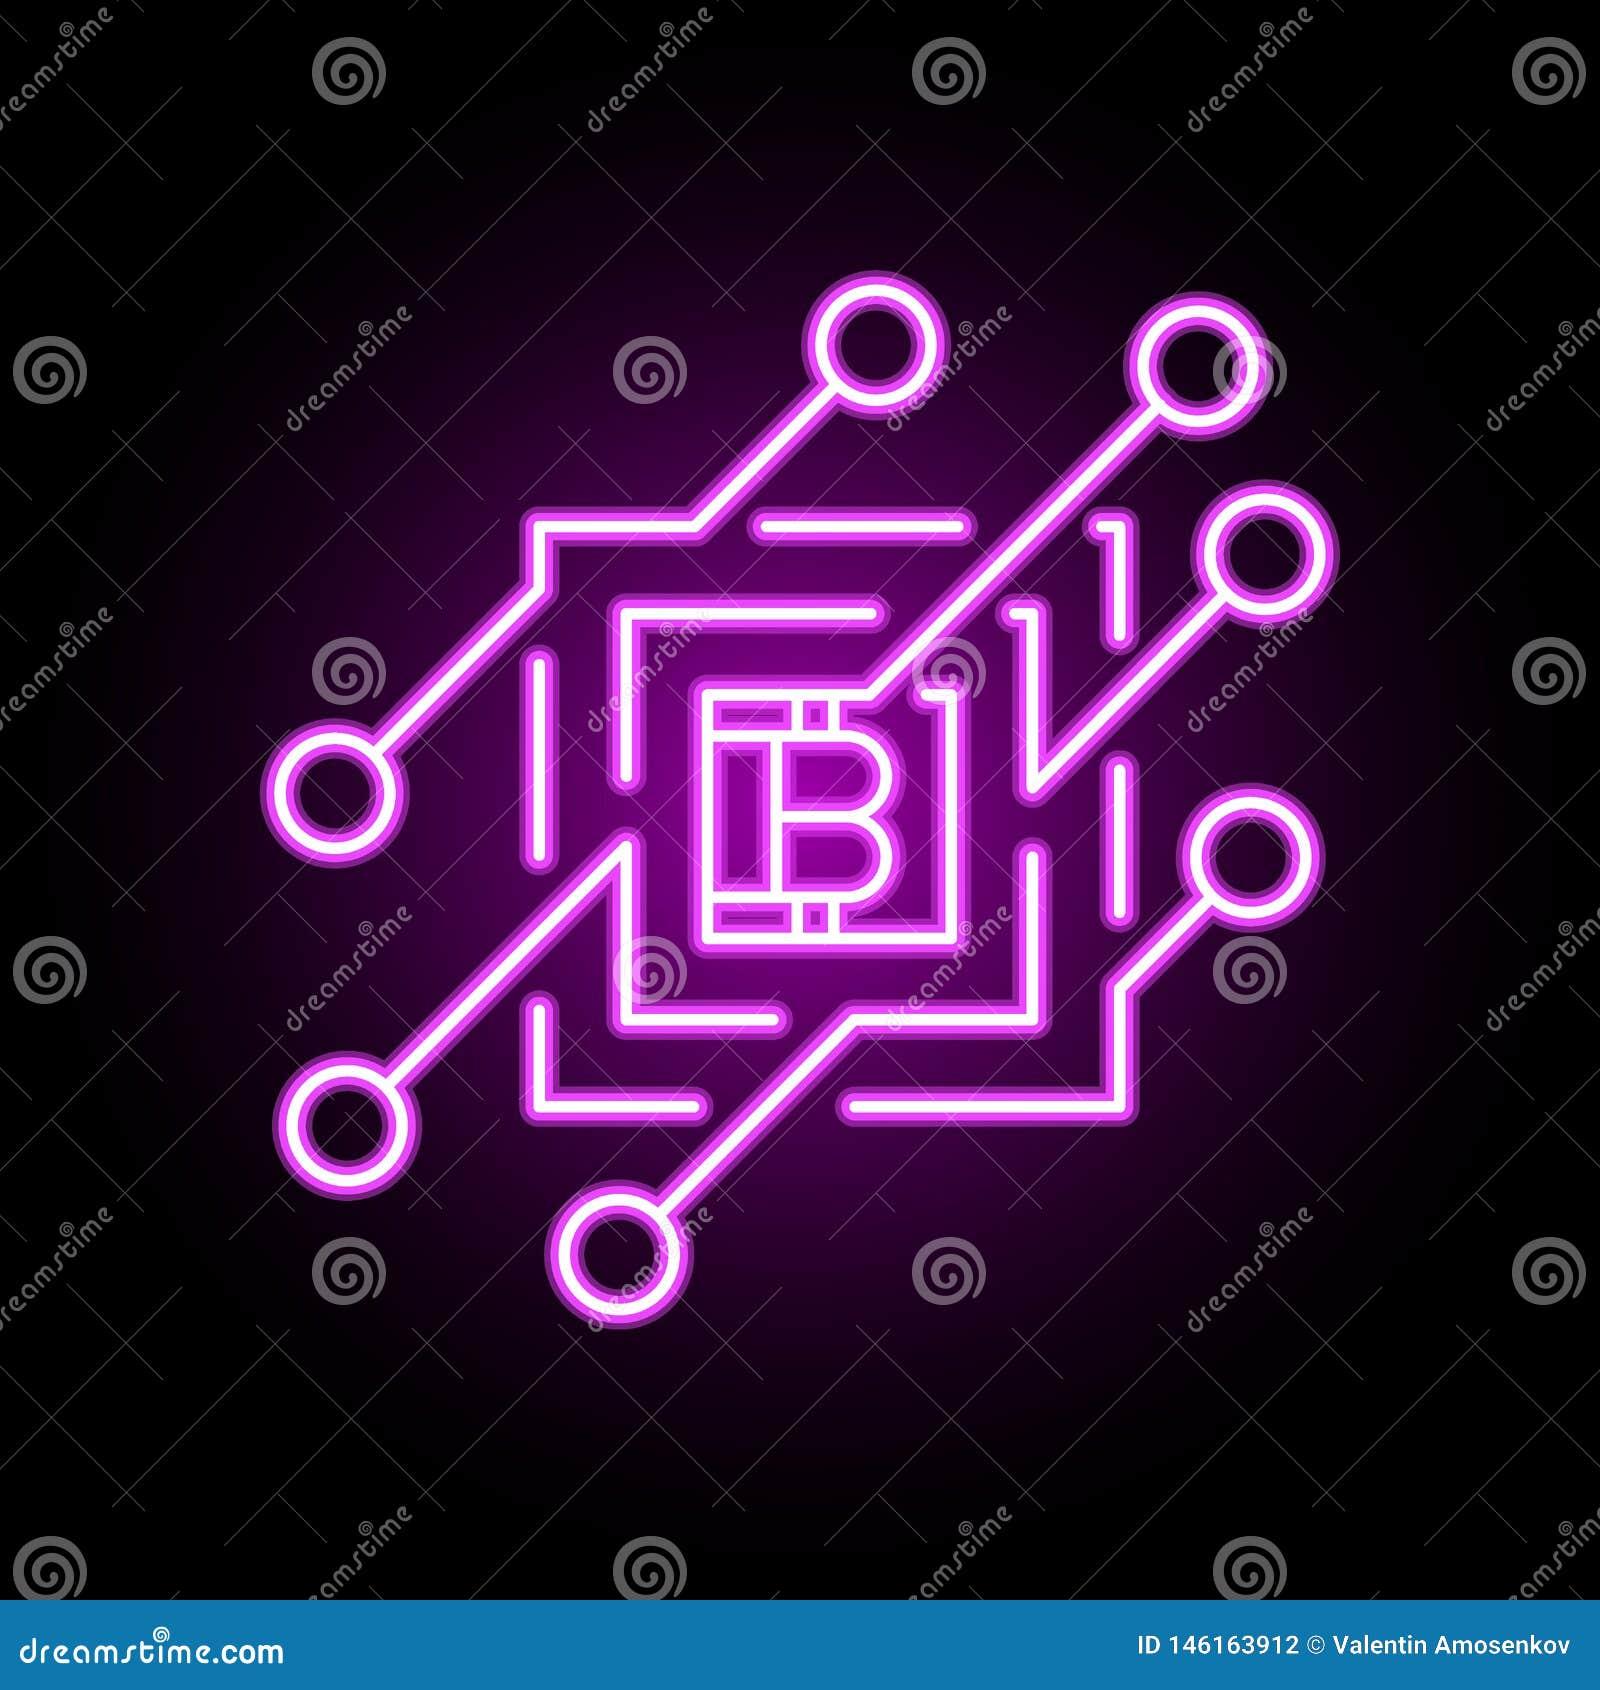 Blockchain vector concept icon or design element in neon style.